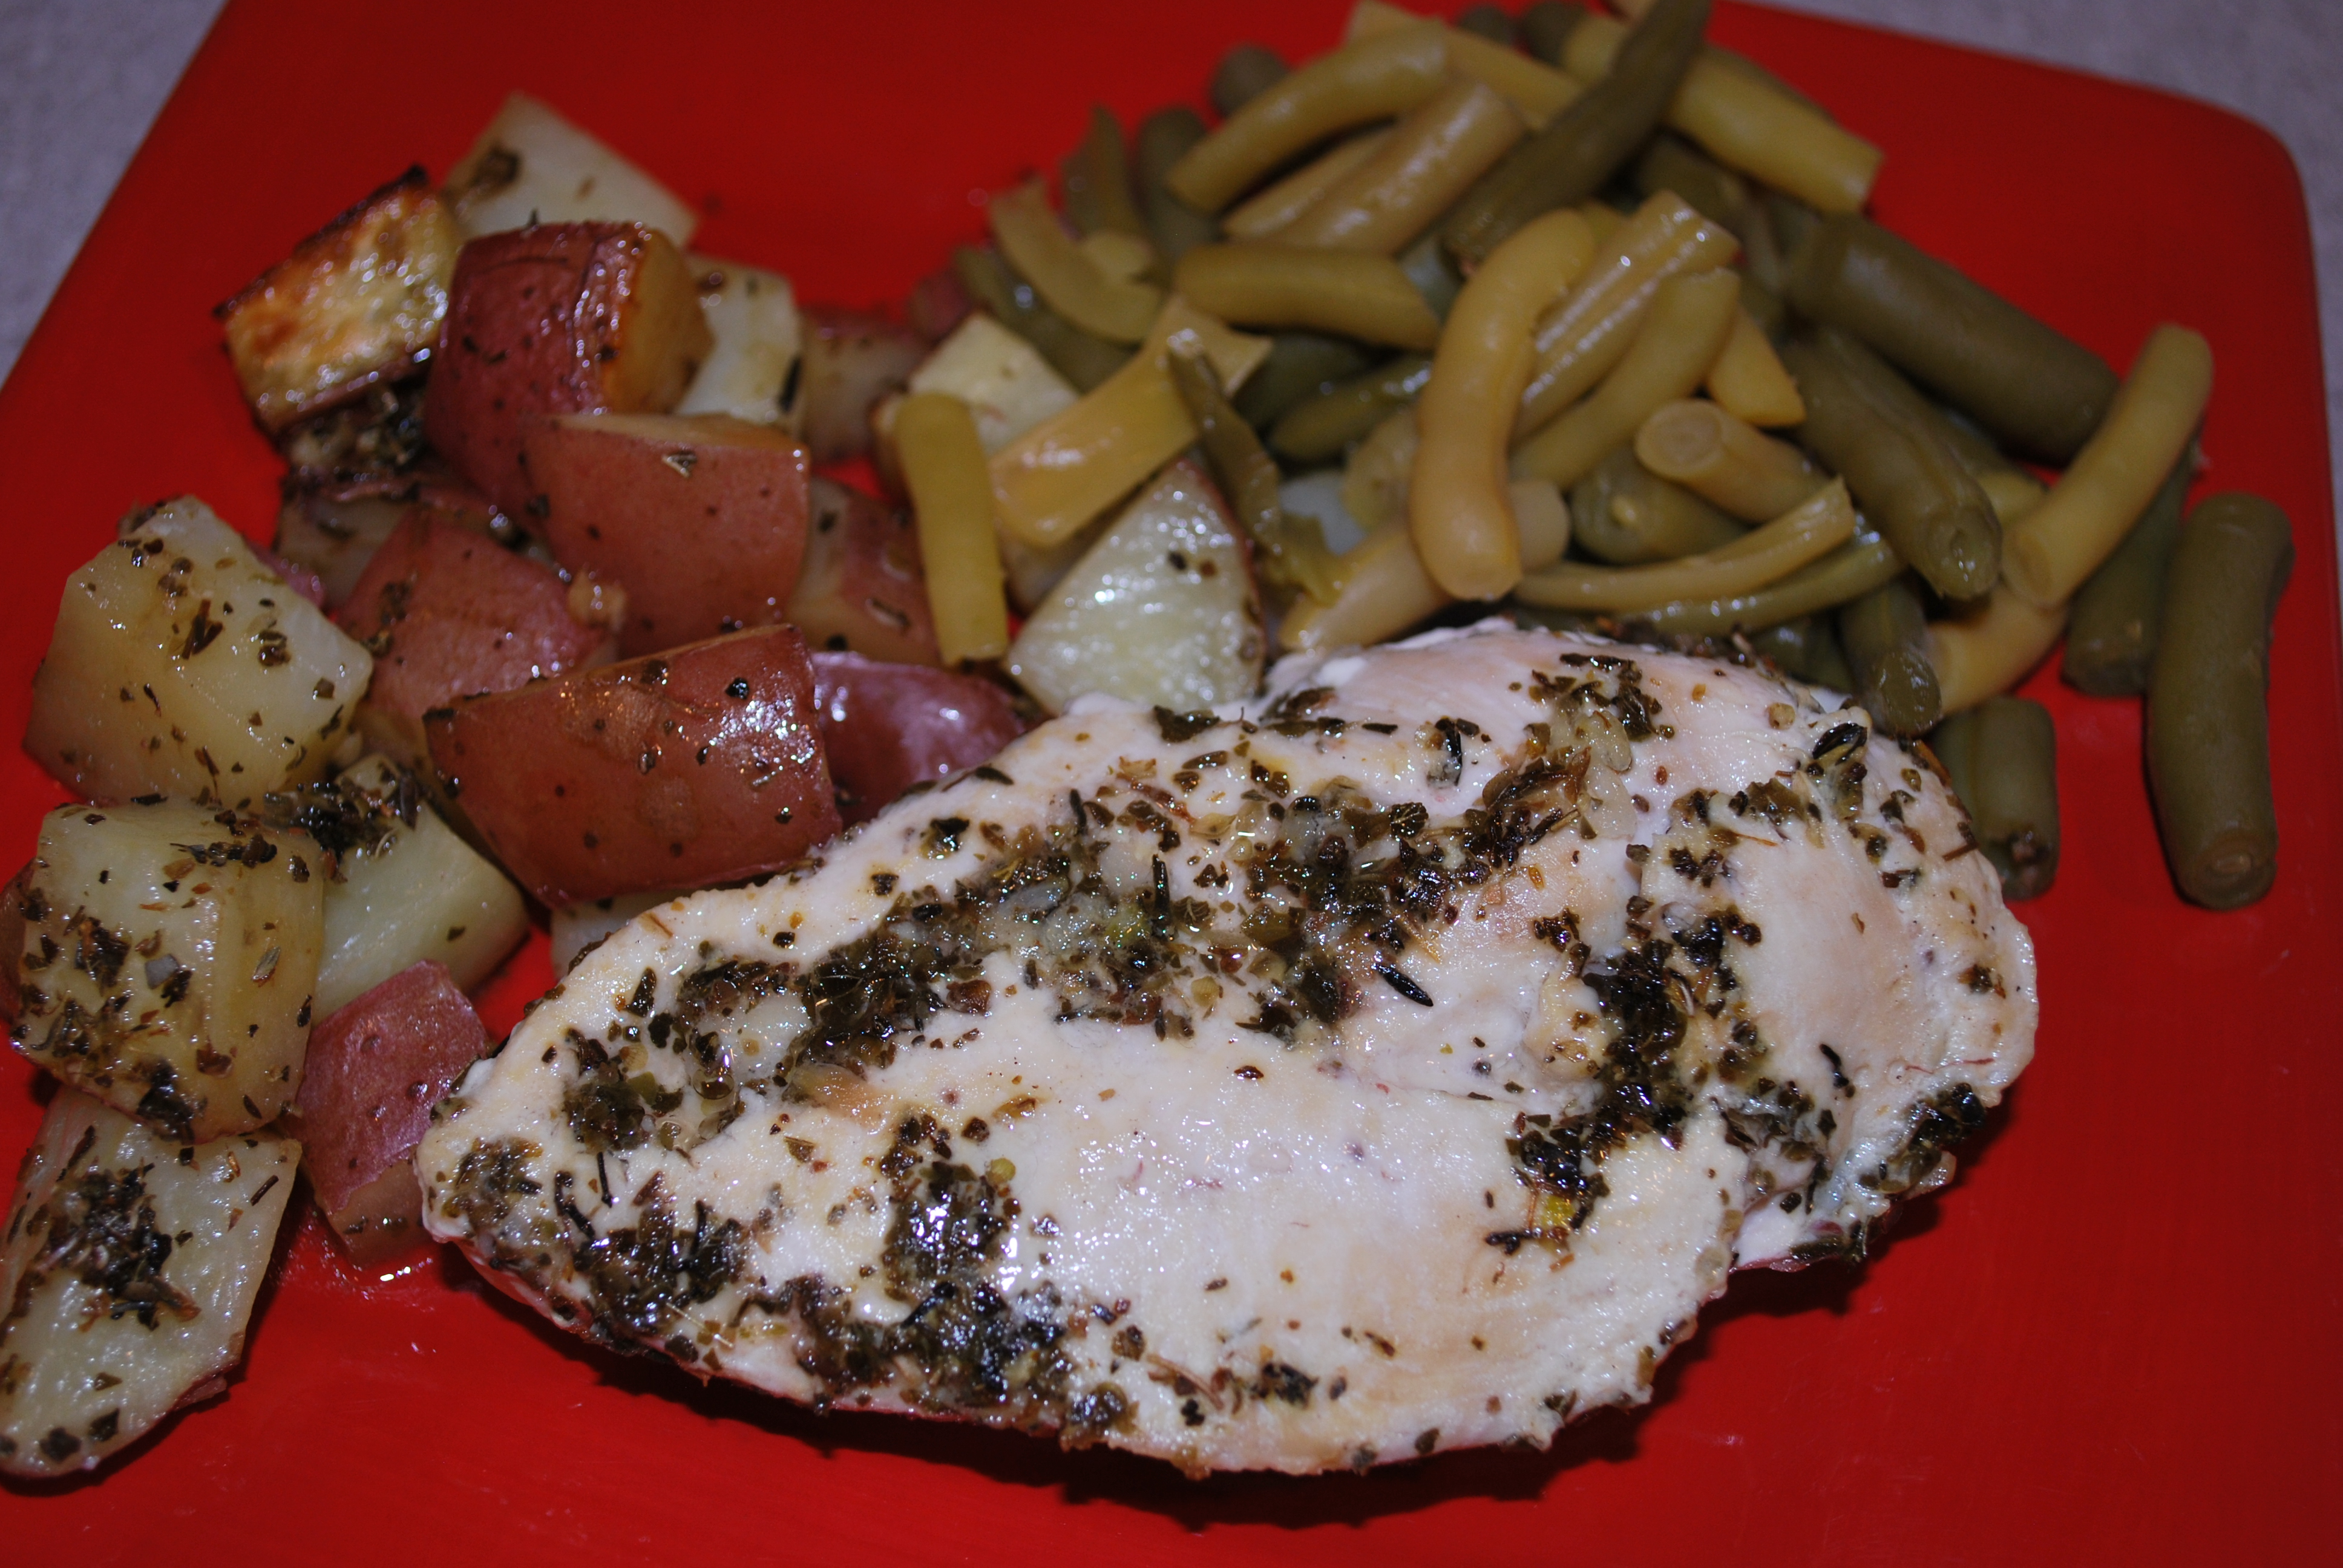 ... : Roasted Greek Chicken and Potatoes in Lemon-Oregano Vinaigrette